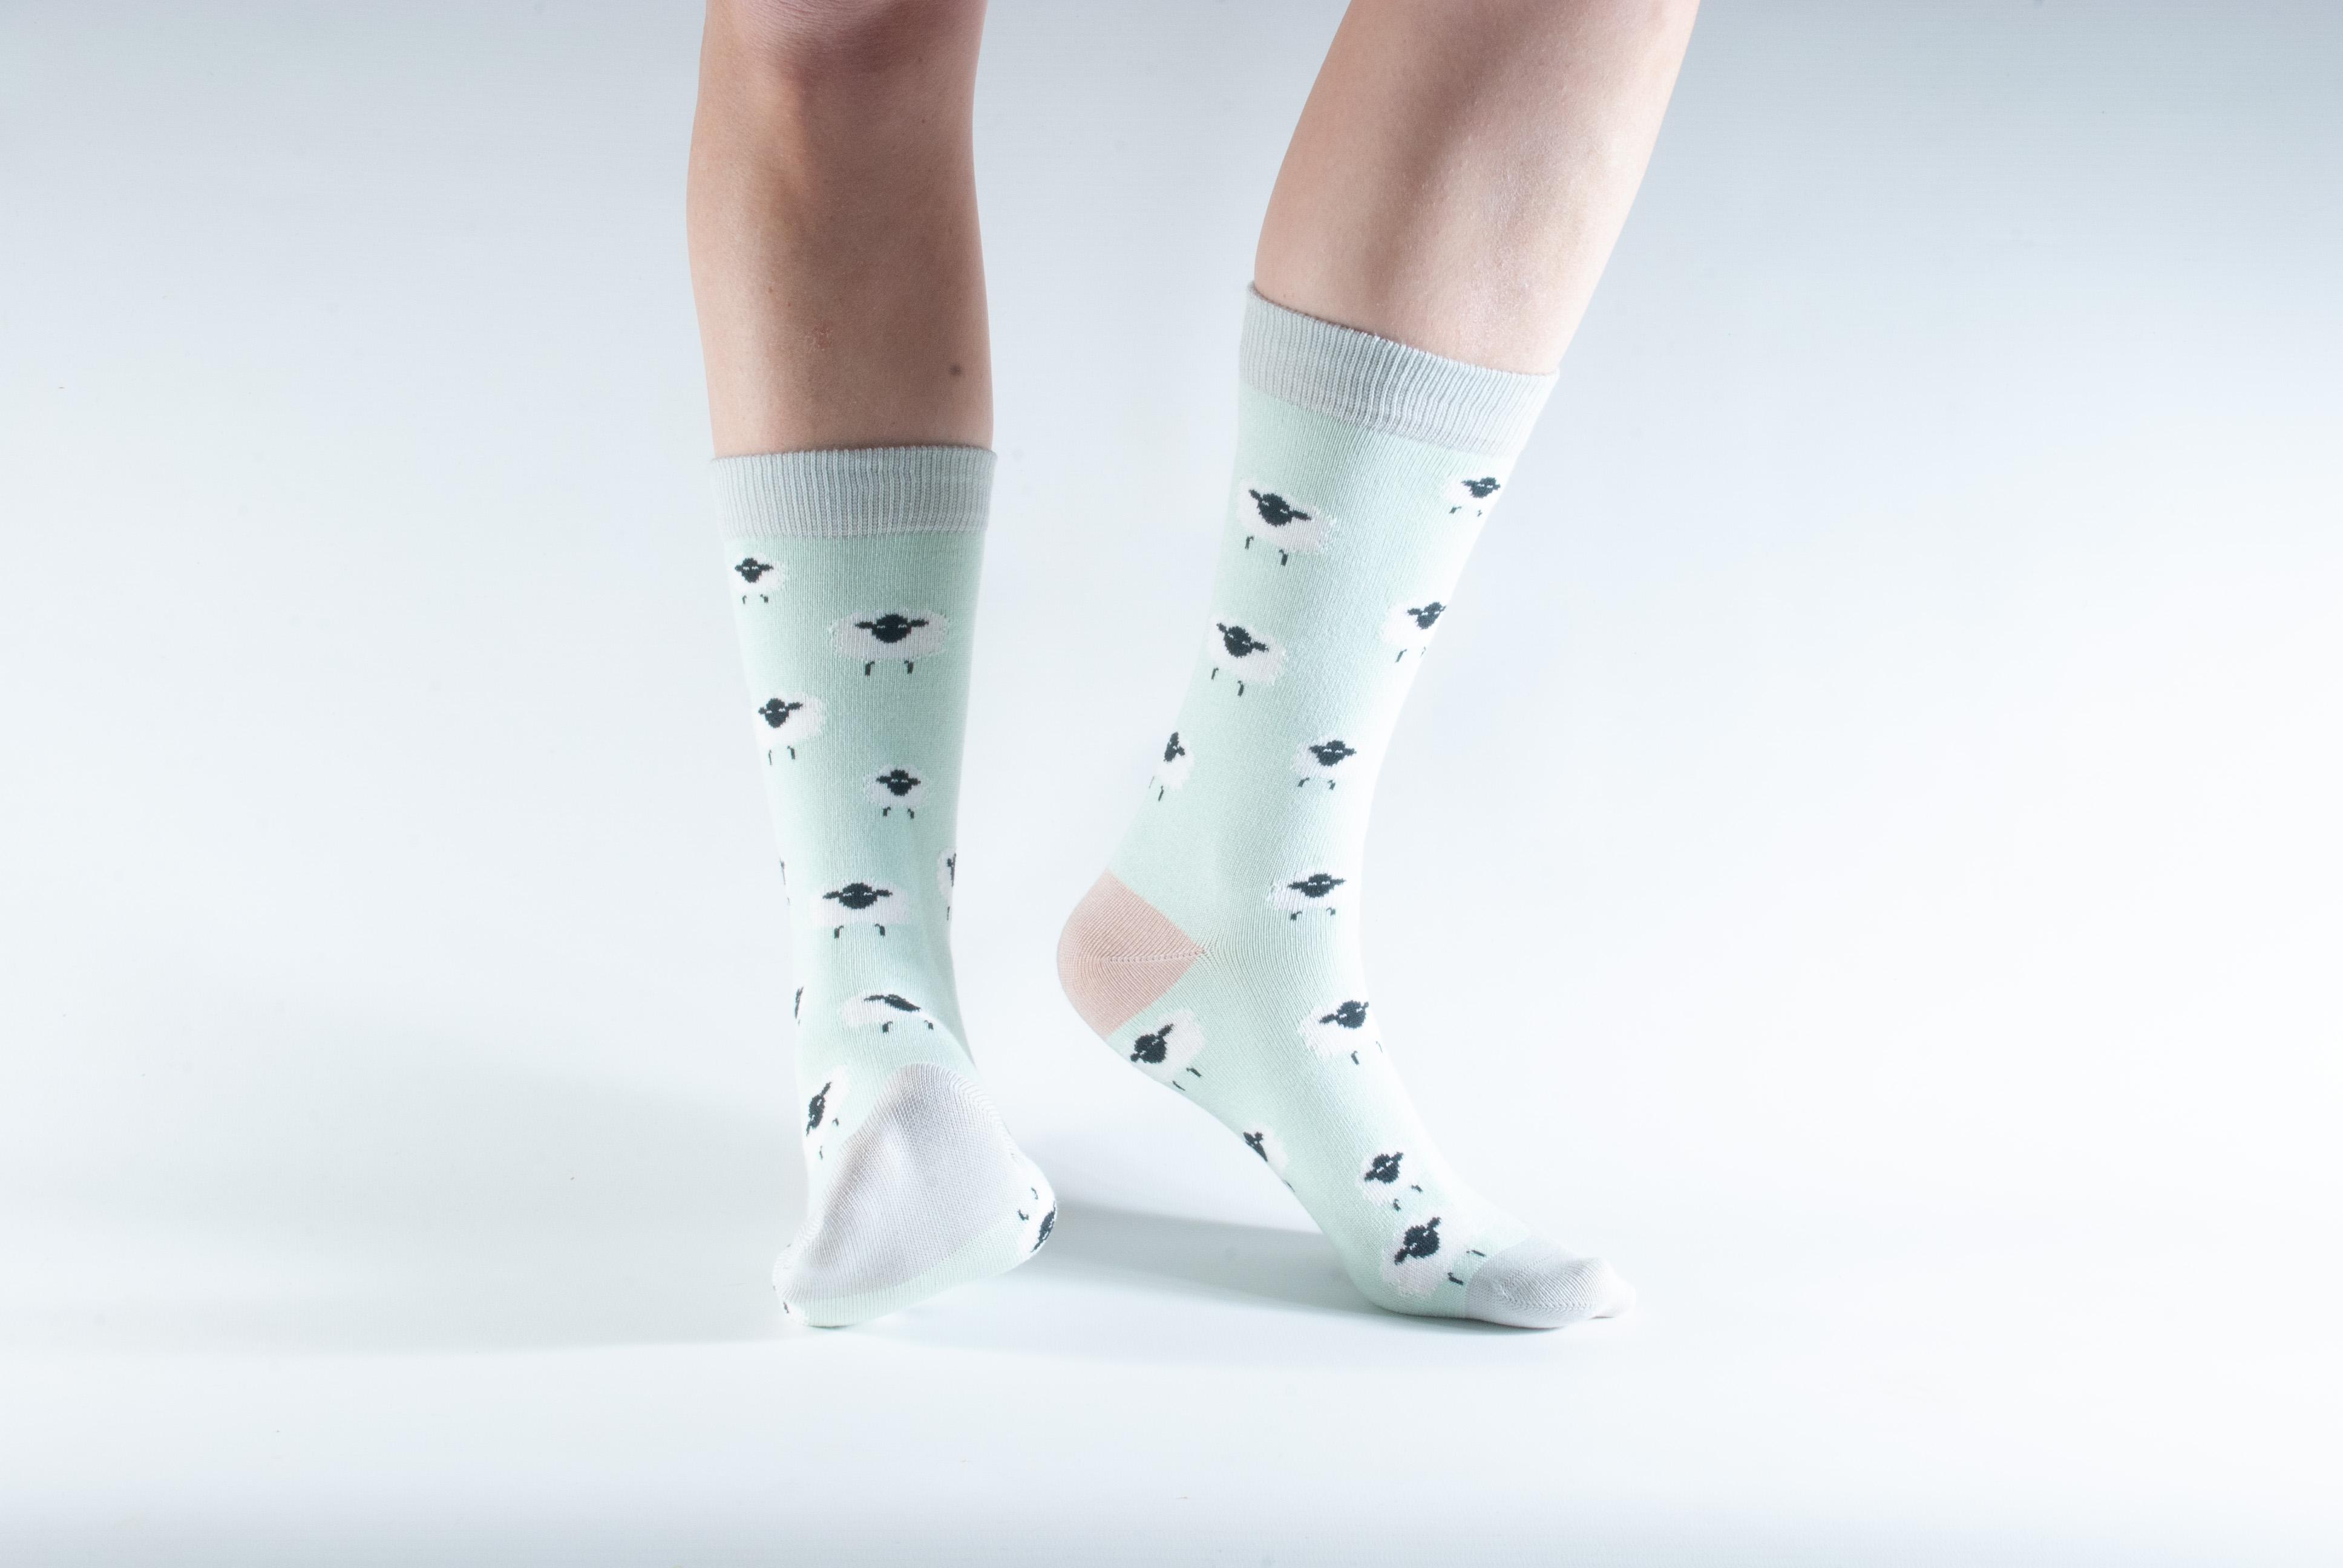 An image relating to Doris & Dude socks